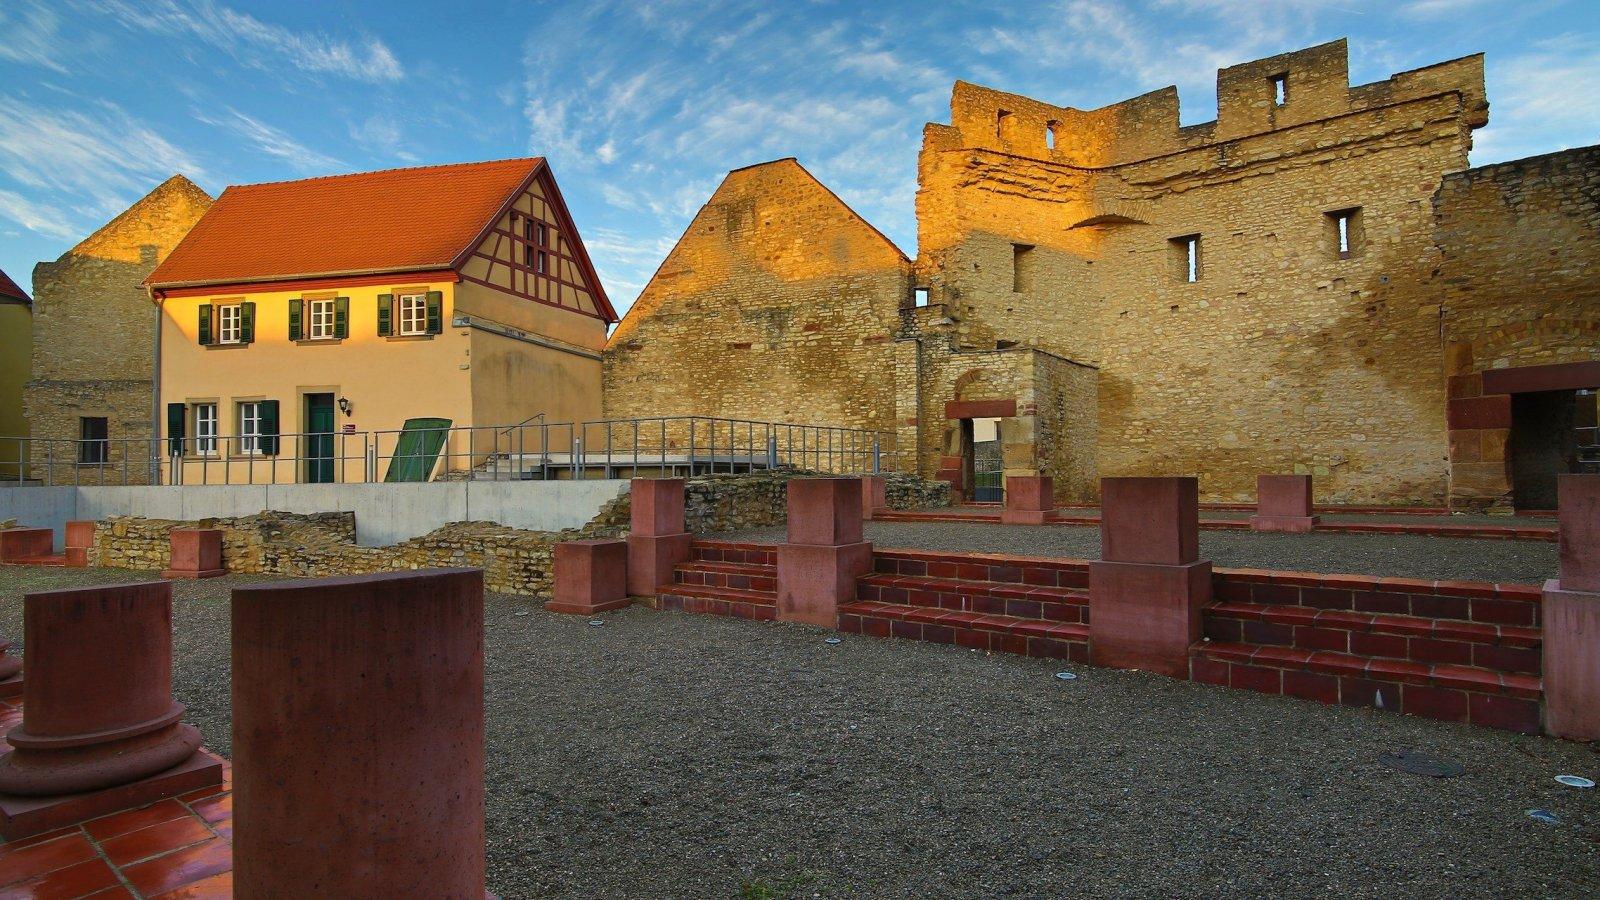 Bilder_R_Oppenheimer/KaiserpfalzIngelheimHeideheimerTor1.jpg